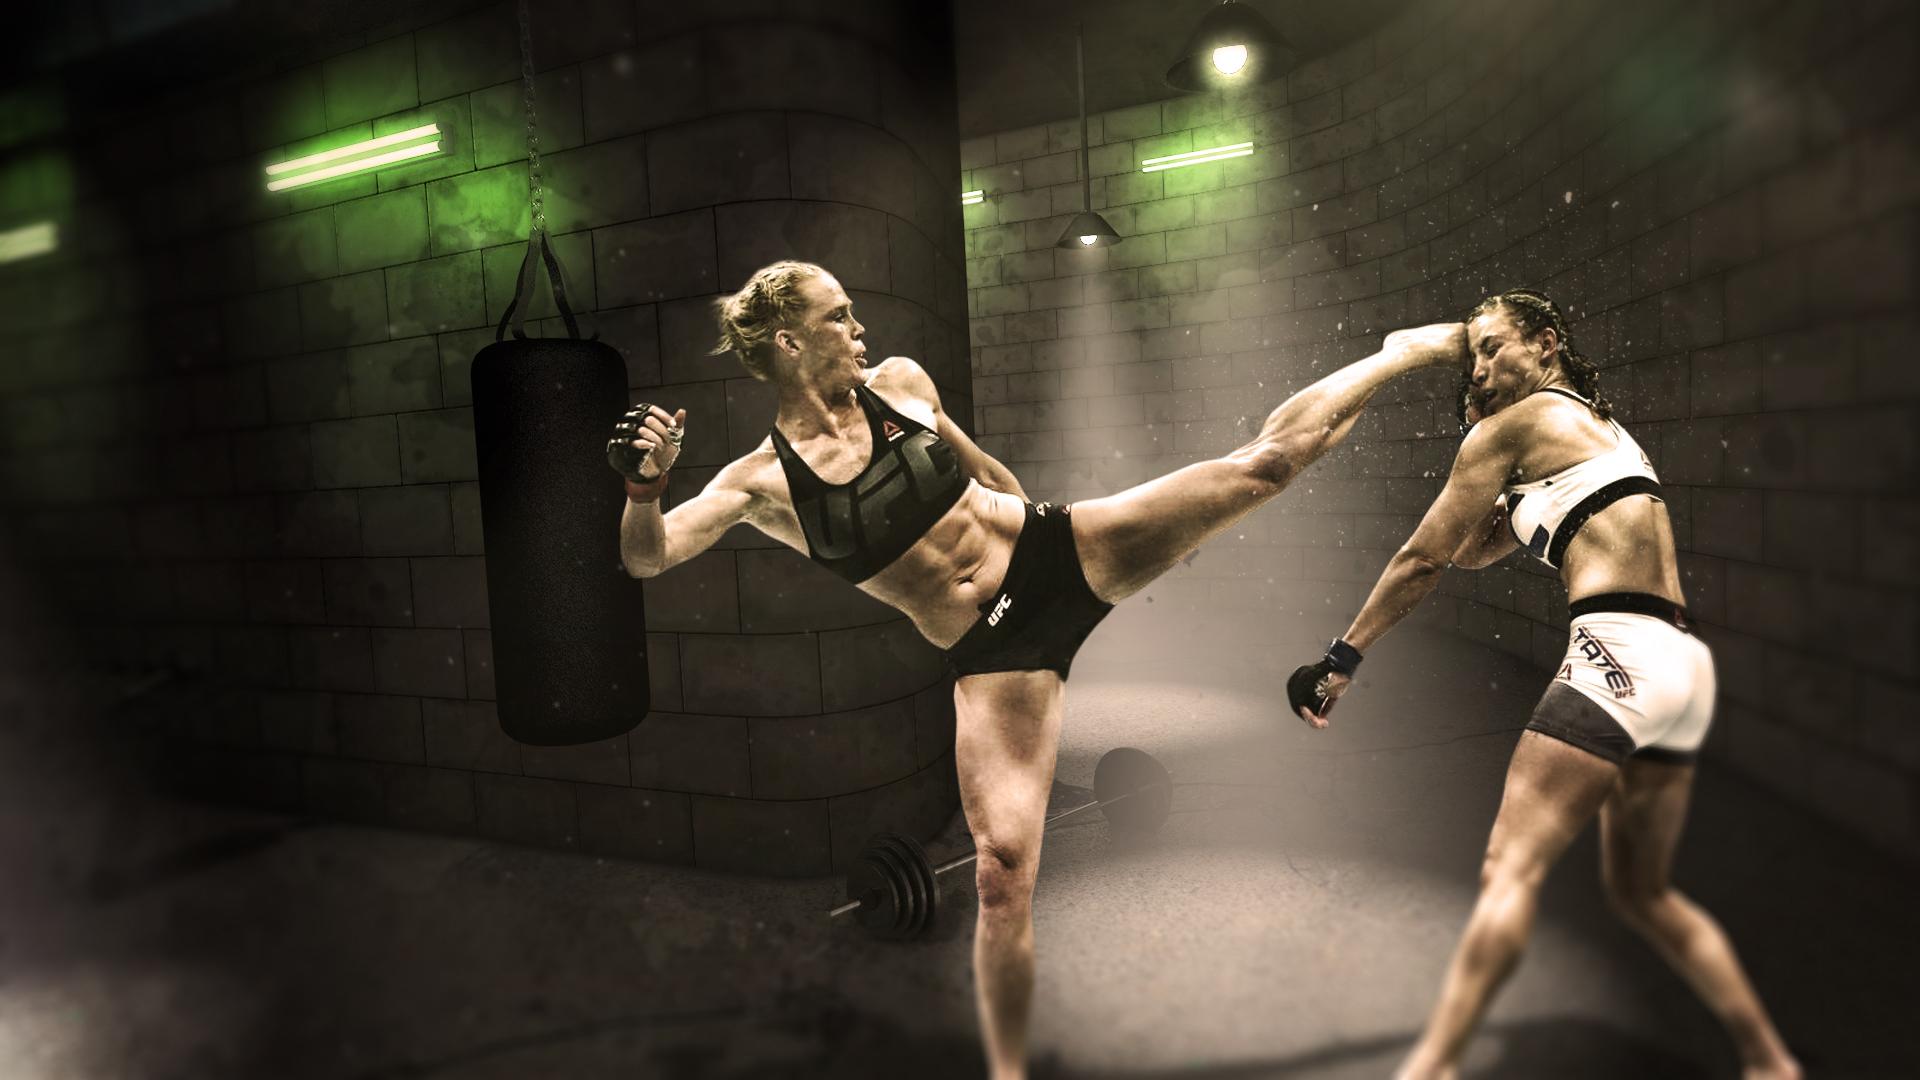 UFC_StyleFrameV2_Frame04_V2.jpg